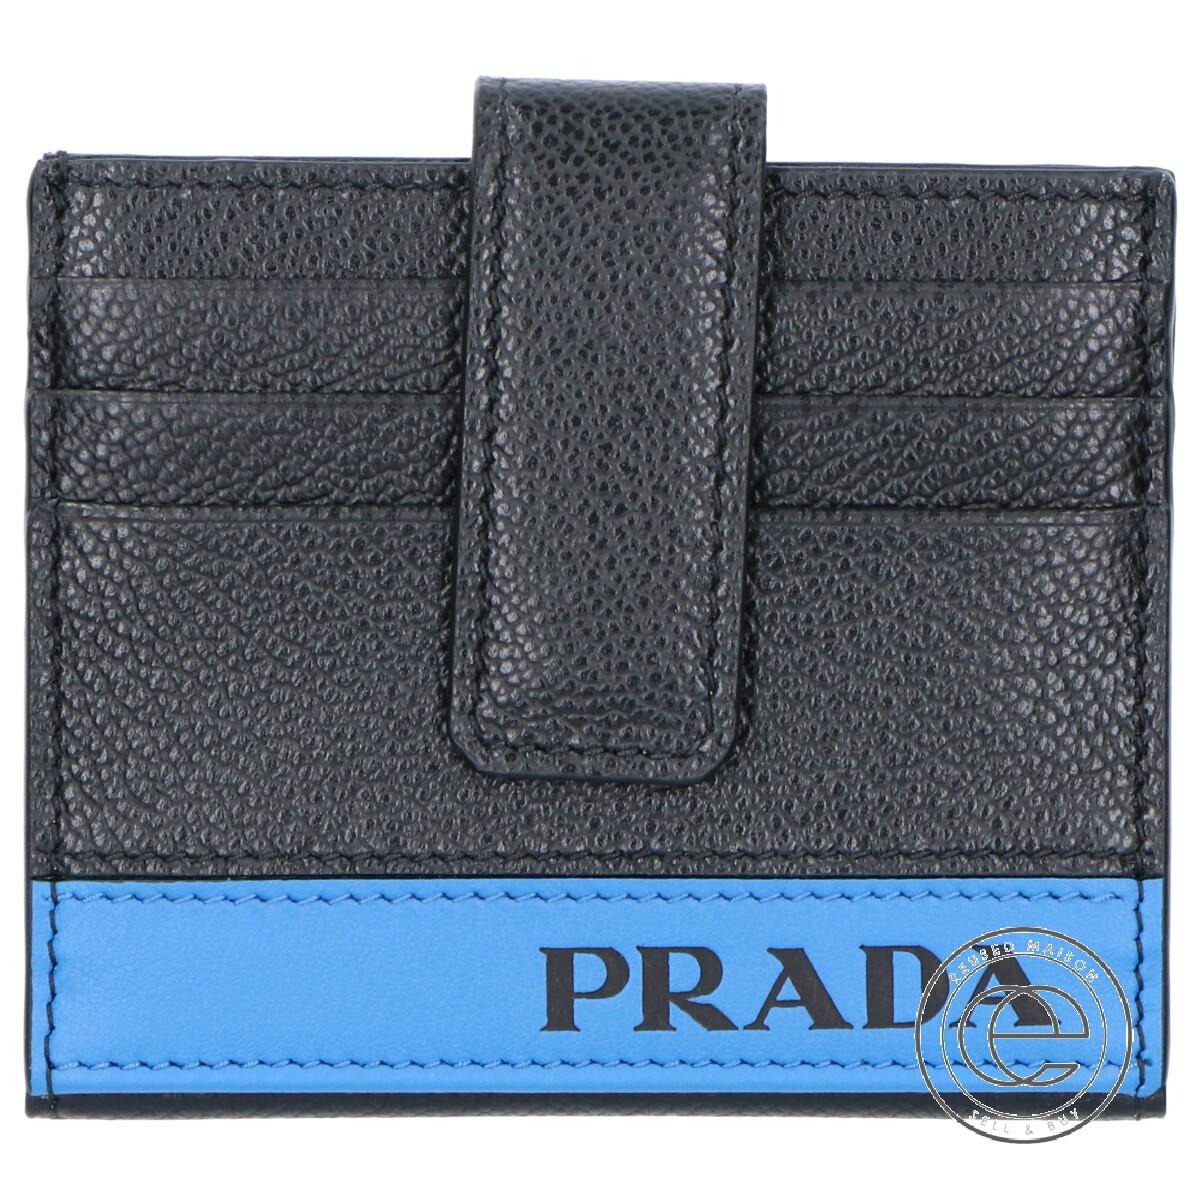 PRADA プラダ 2MC049 2CIG VIT.MICRO GRAIN レザー 二つ折り カードケース NERO+MAREA メンズ 【中古】